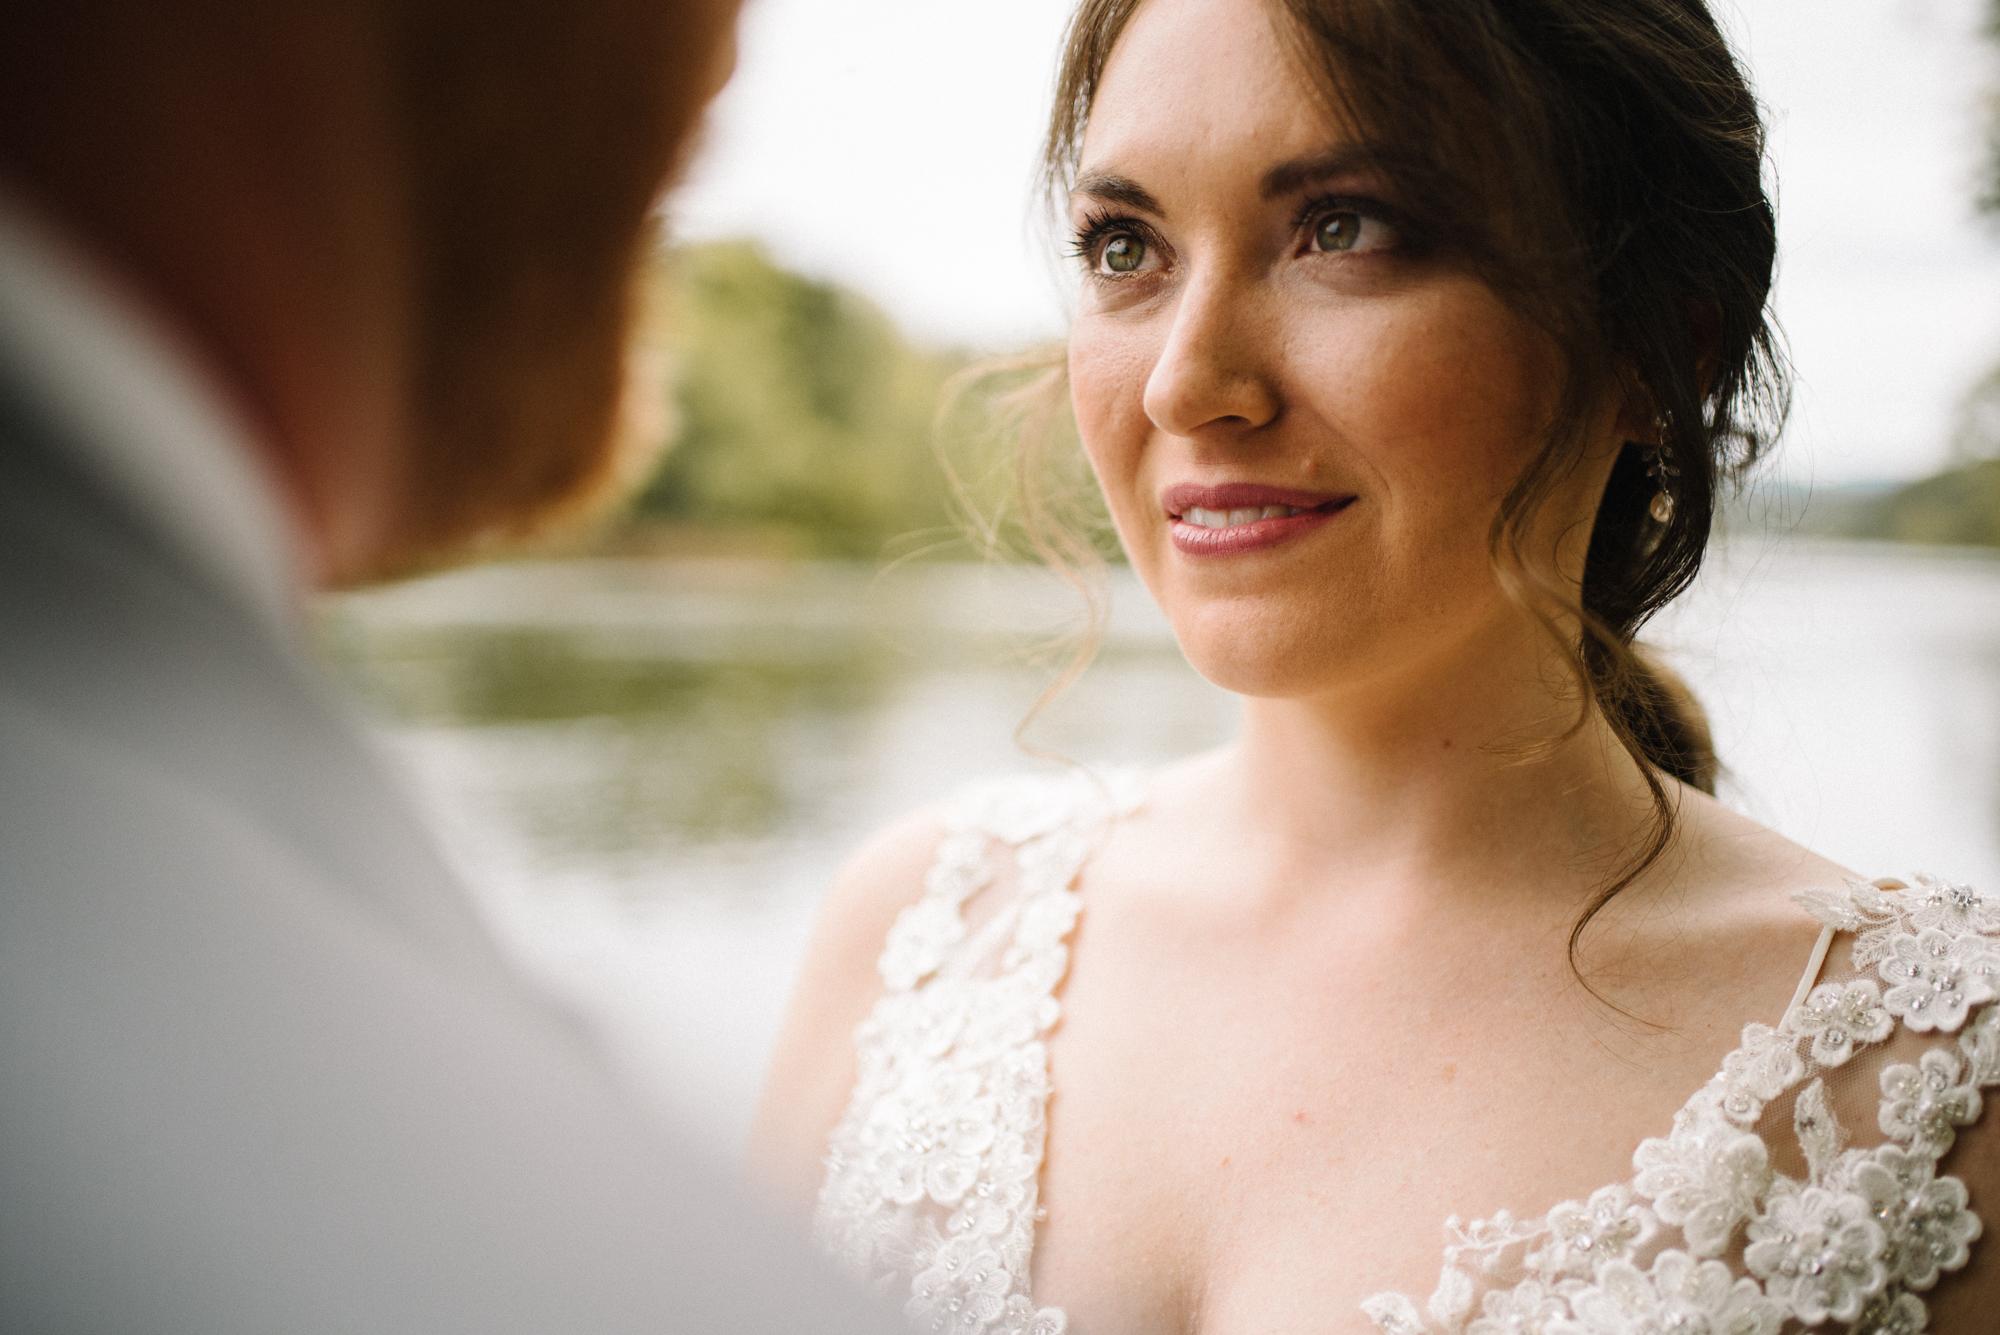 Mandi-and-Jordan-Intimate-Backyard-River-Wedding-Shenandoah-Valley_48.JPG